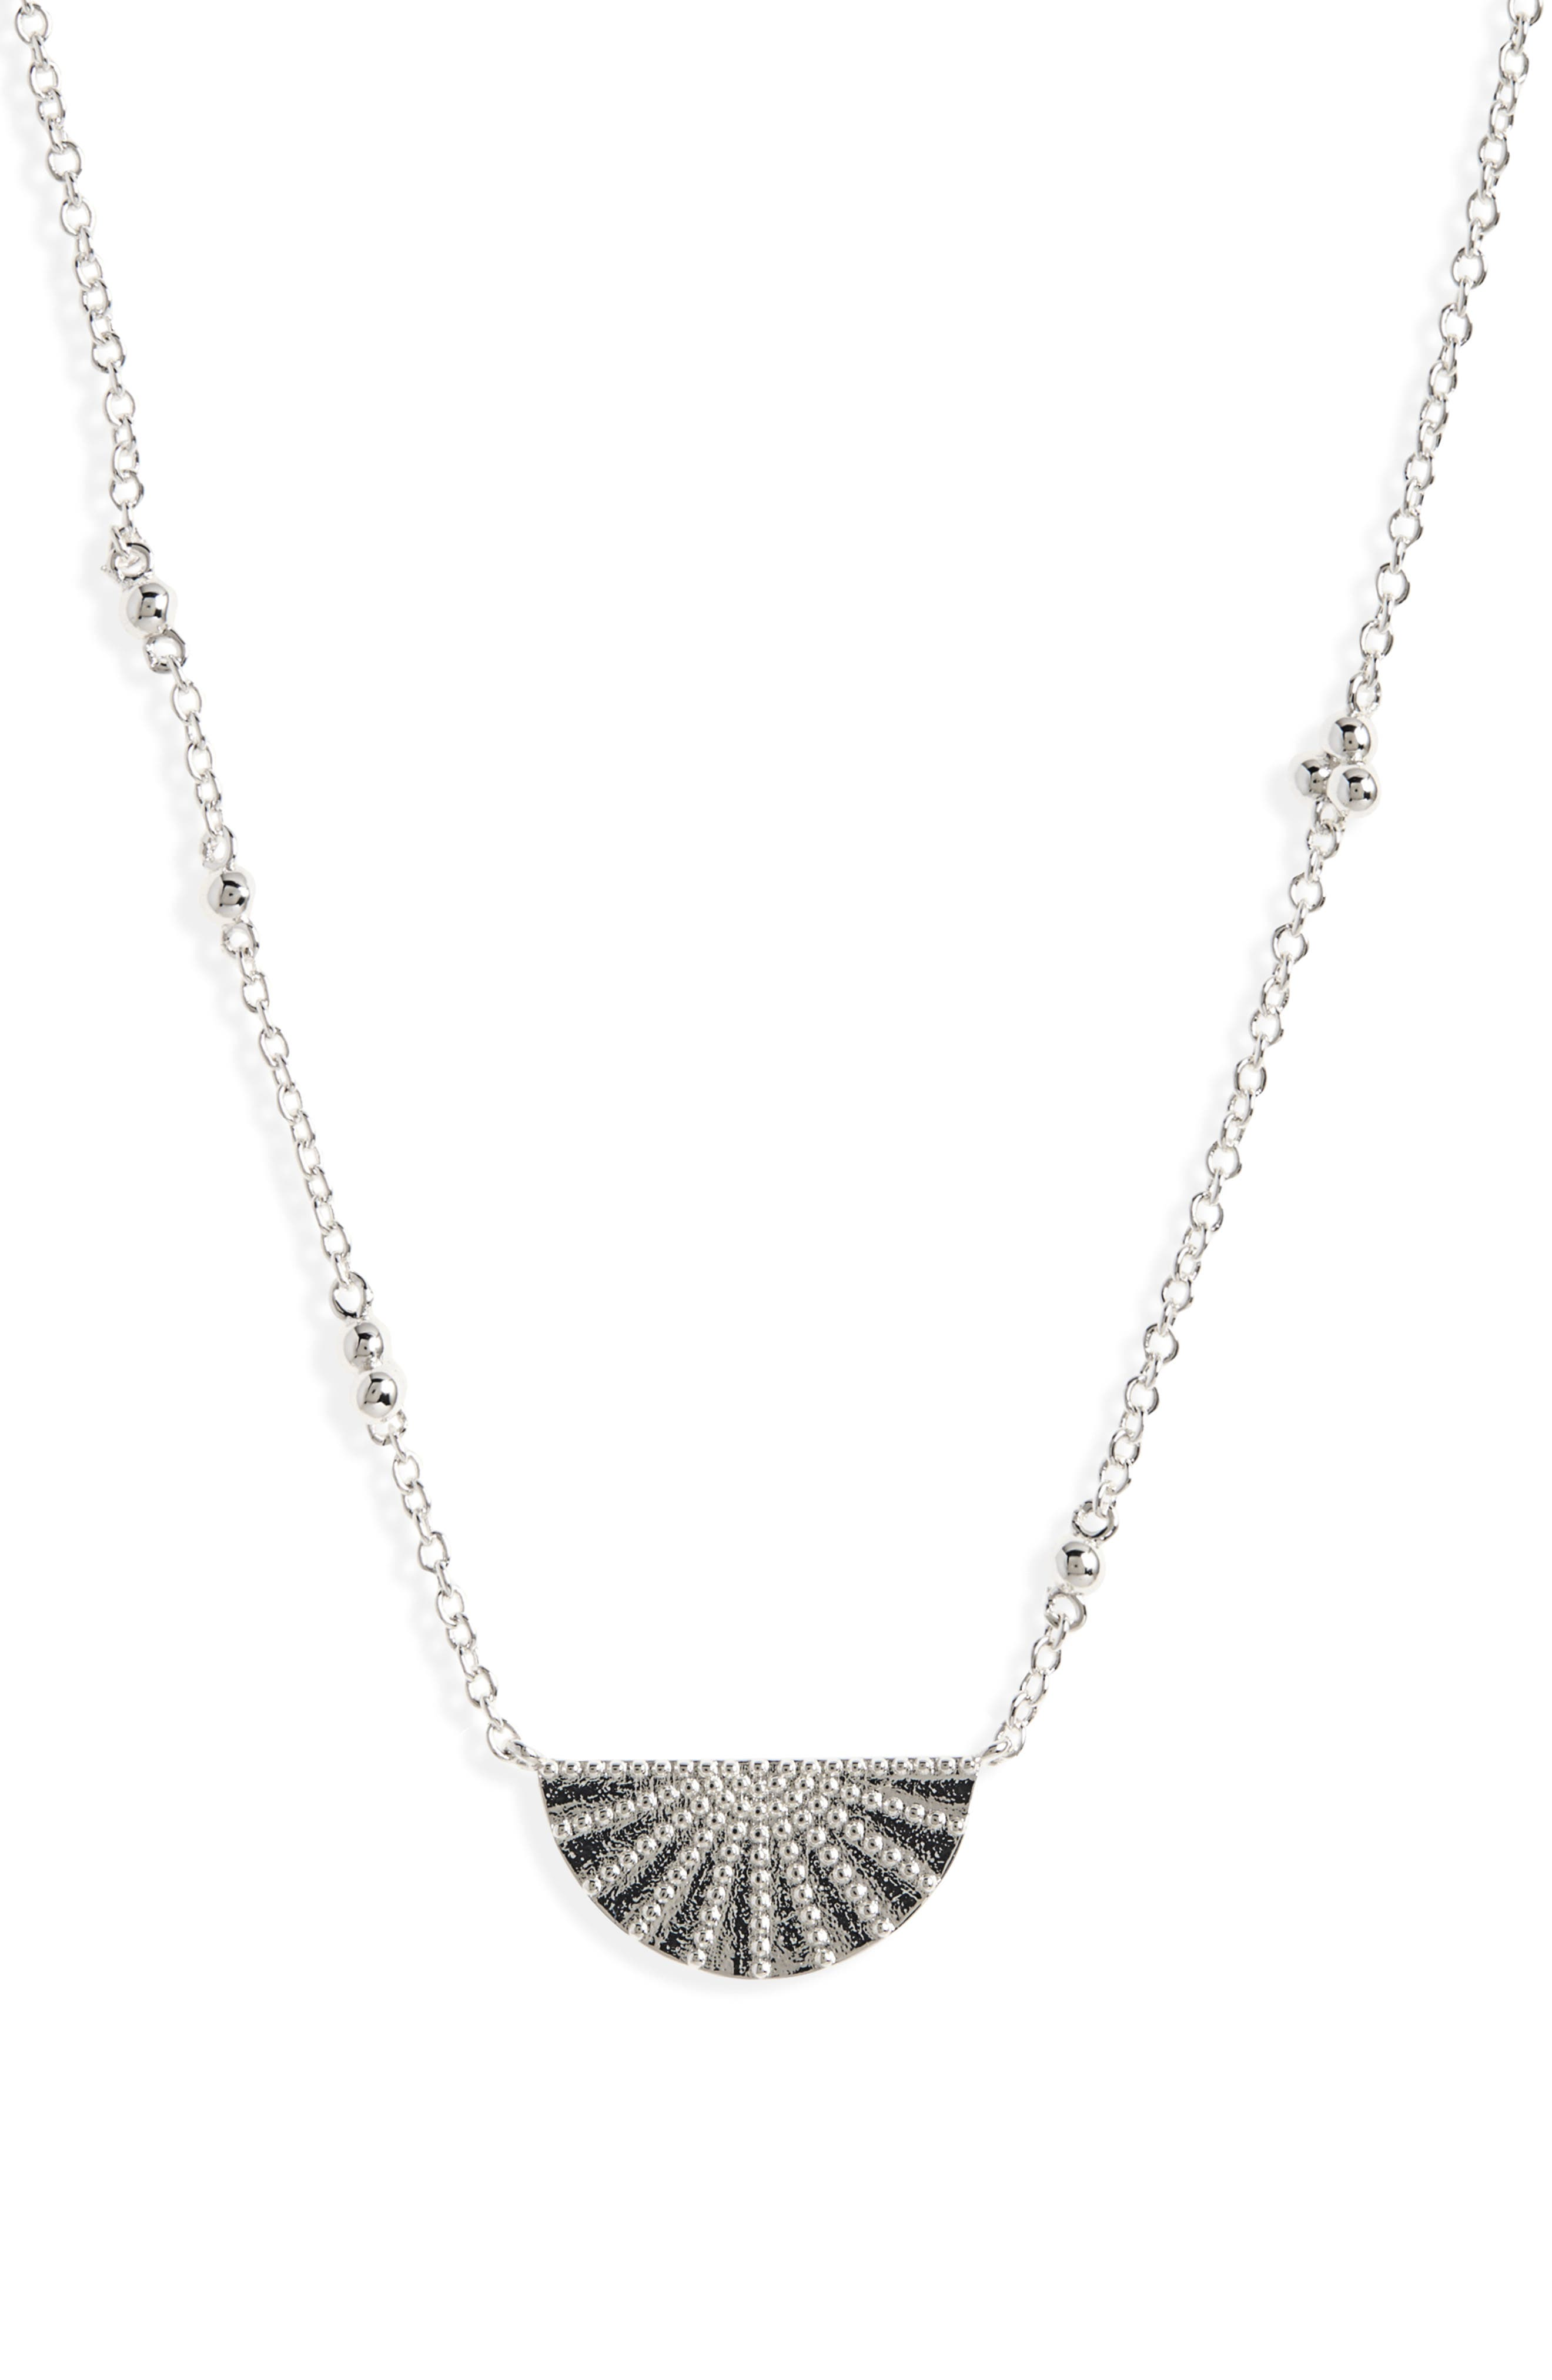 Costa Pendant Necklace